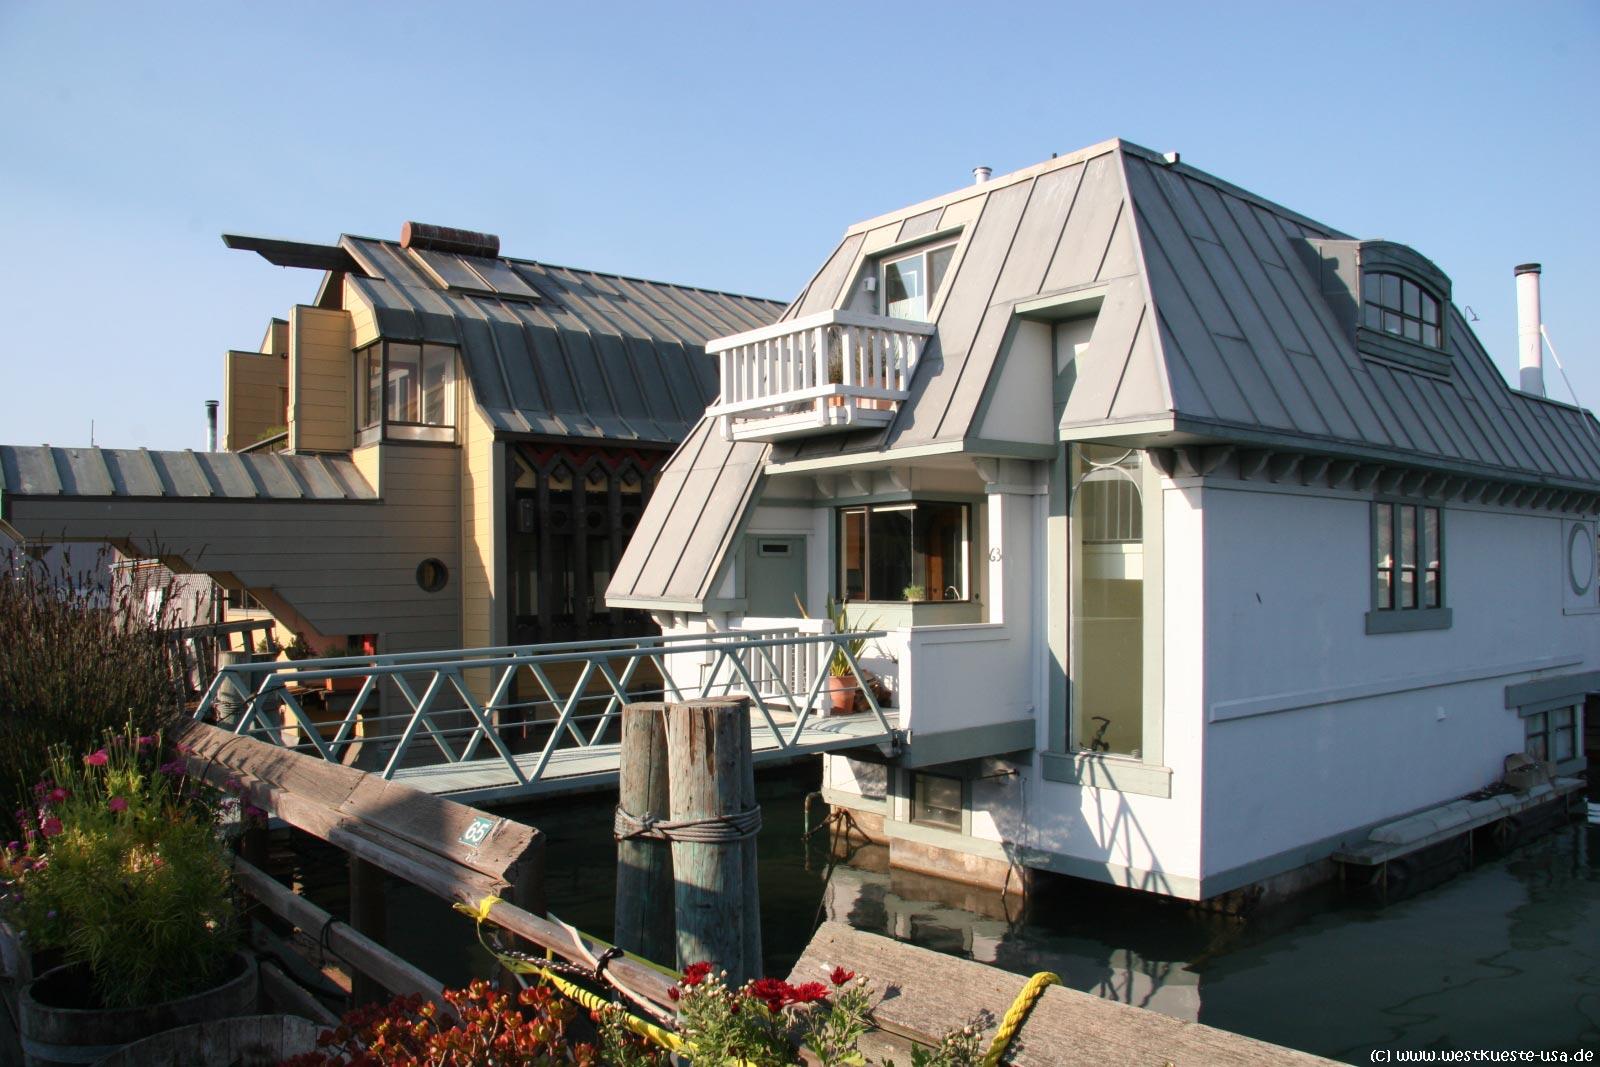 sausalito houseboats schwimmende hausboote in der san francisco bay. Black Bedroom Furniture Sets. Home Design Ideas